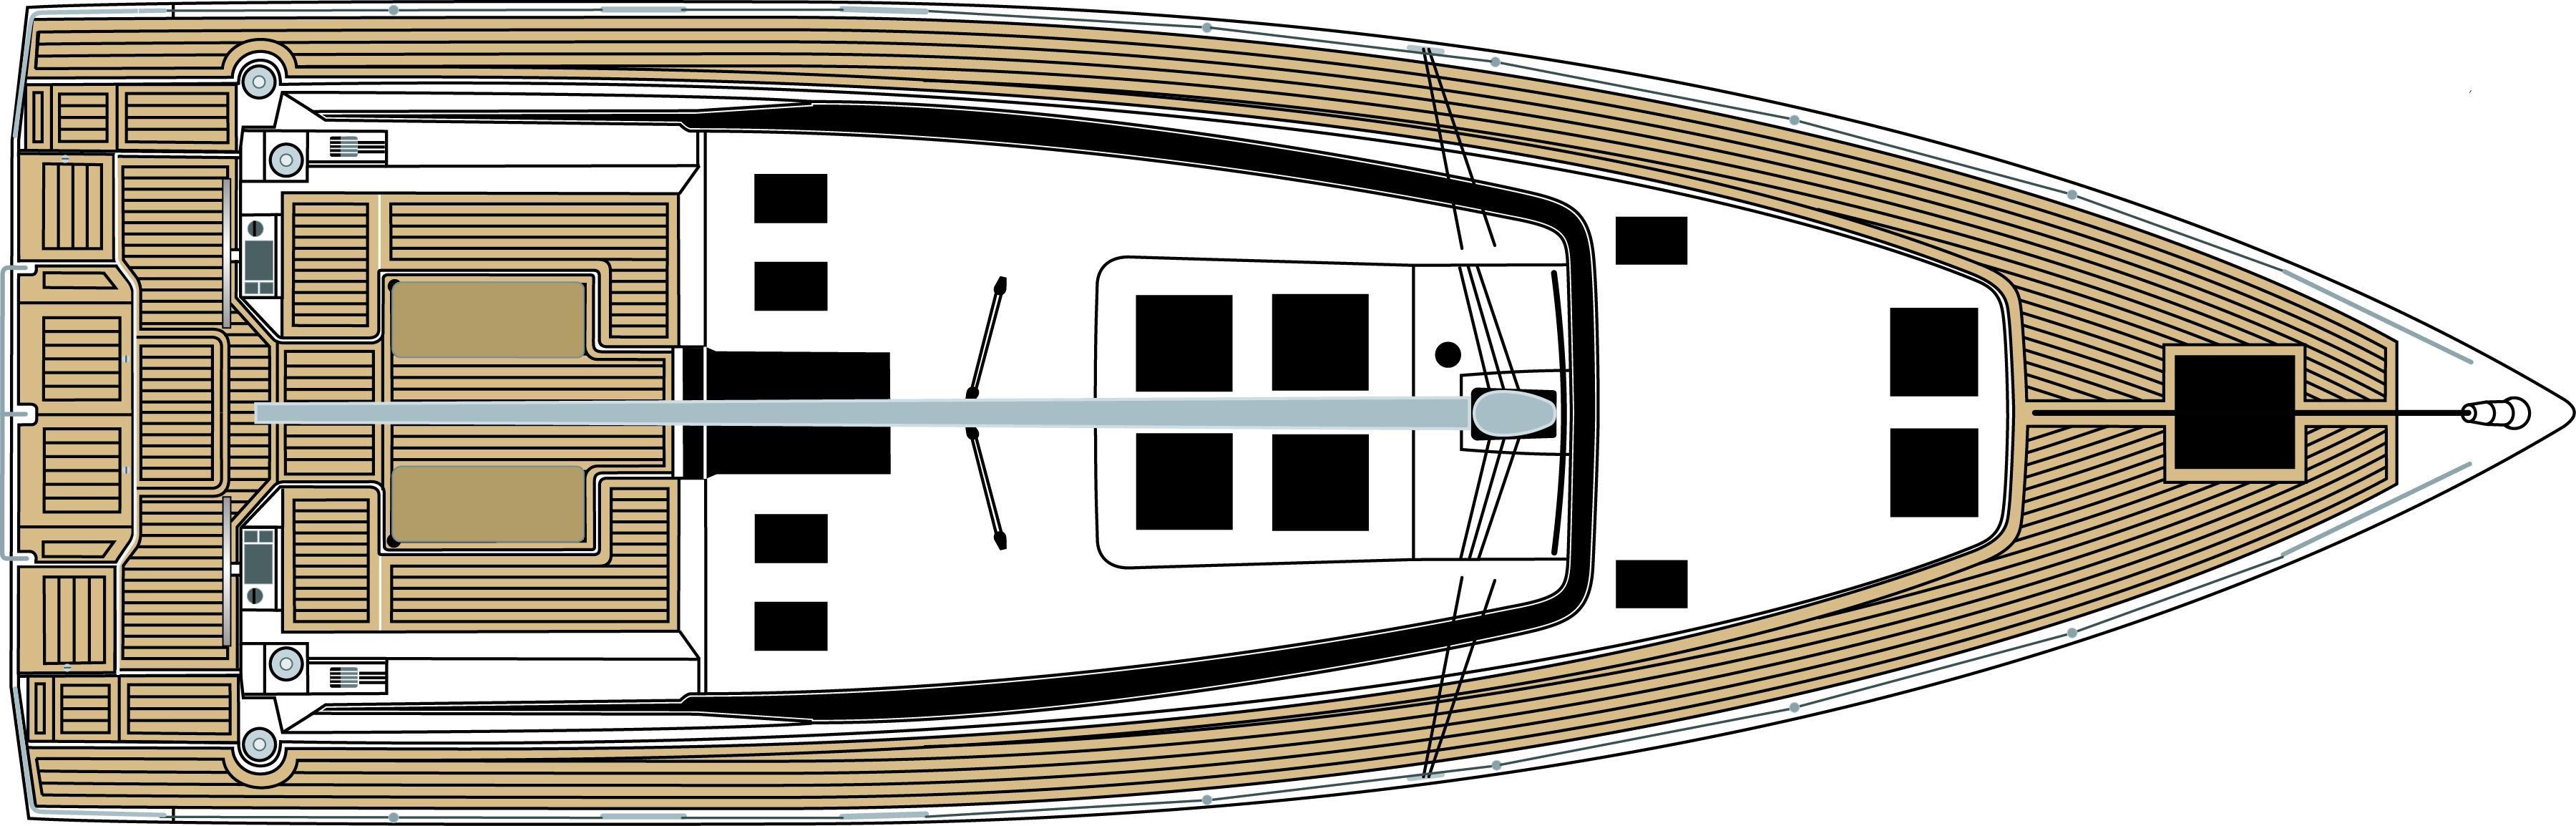 Bavaria C57 For Sale.